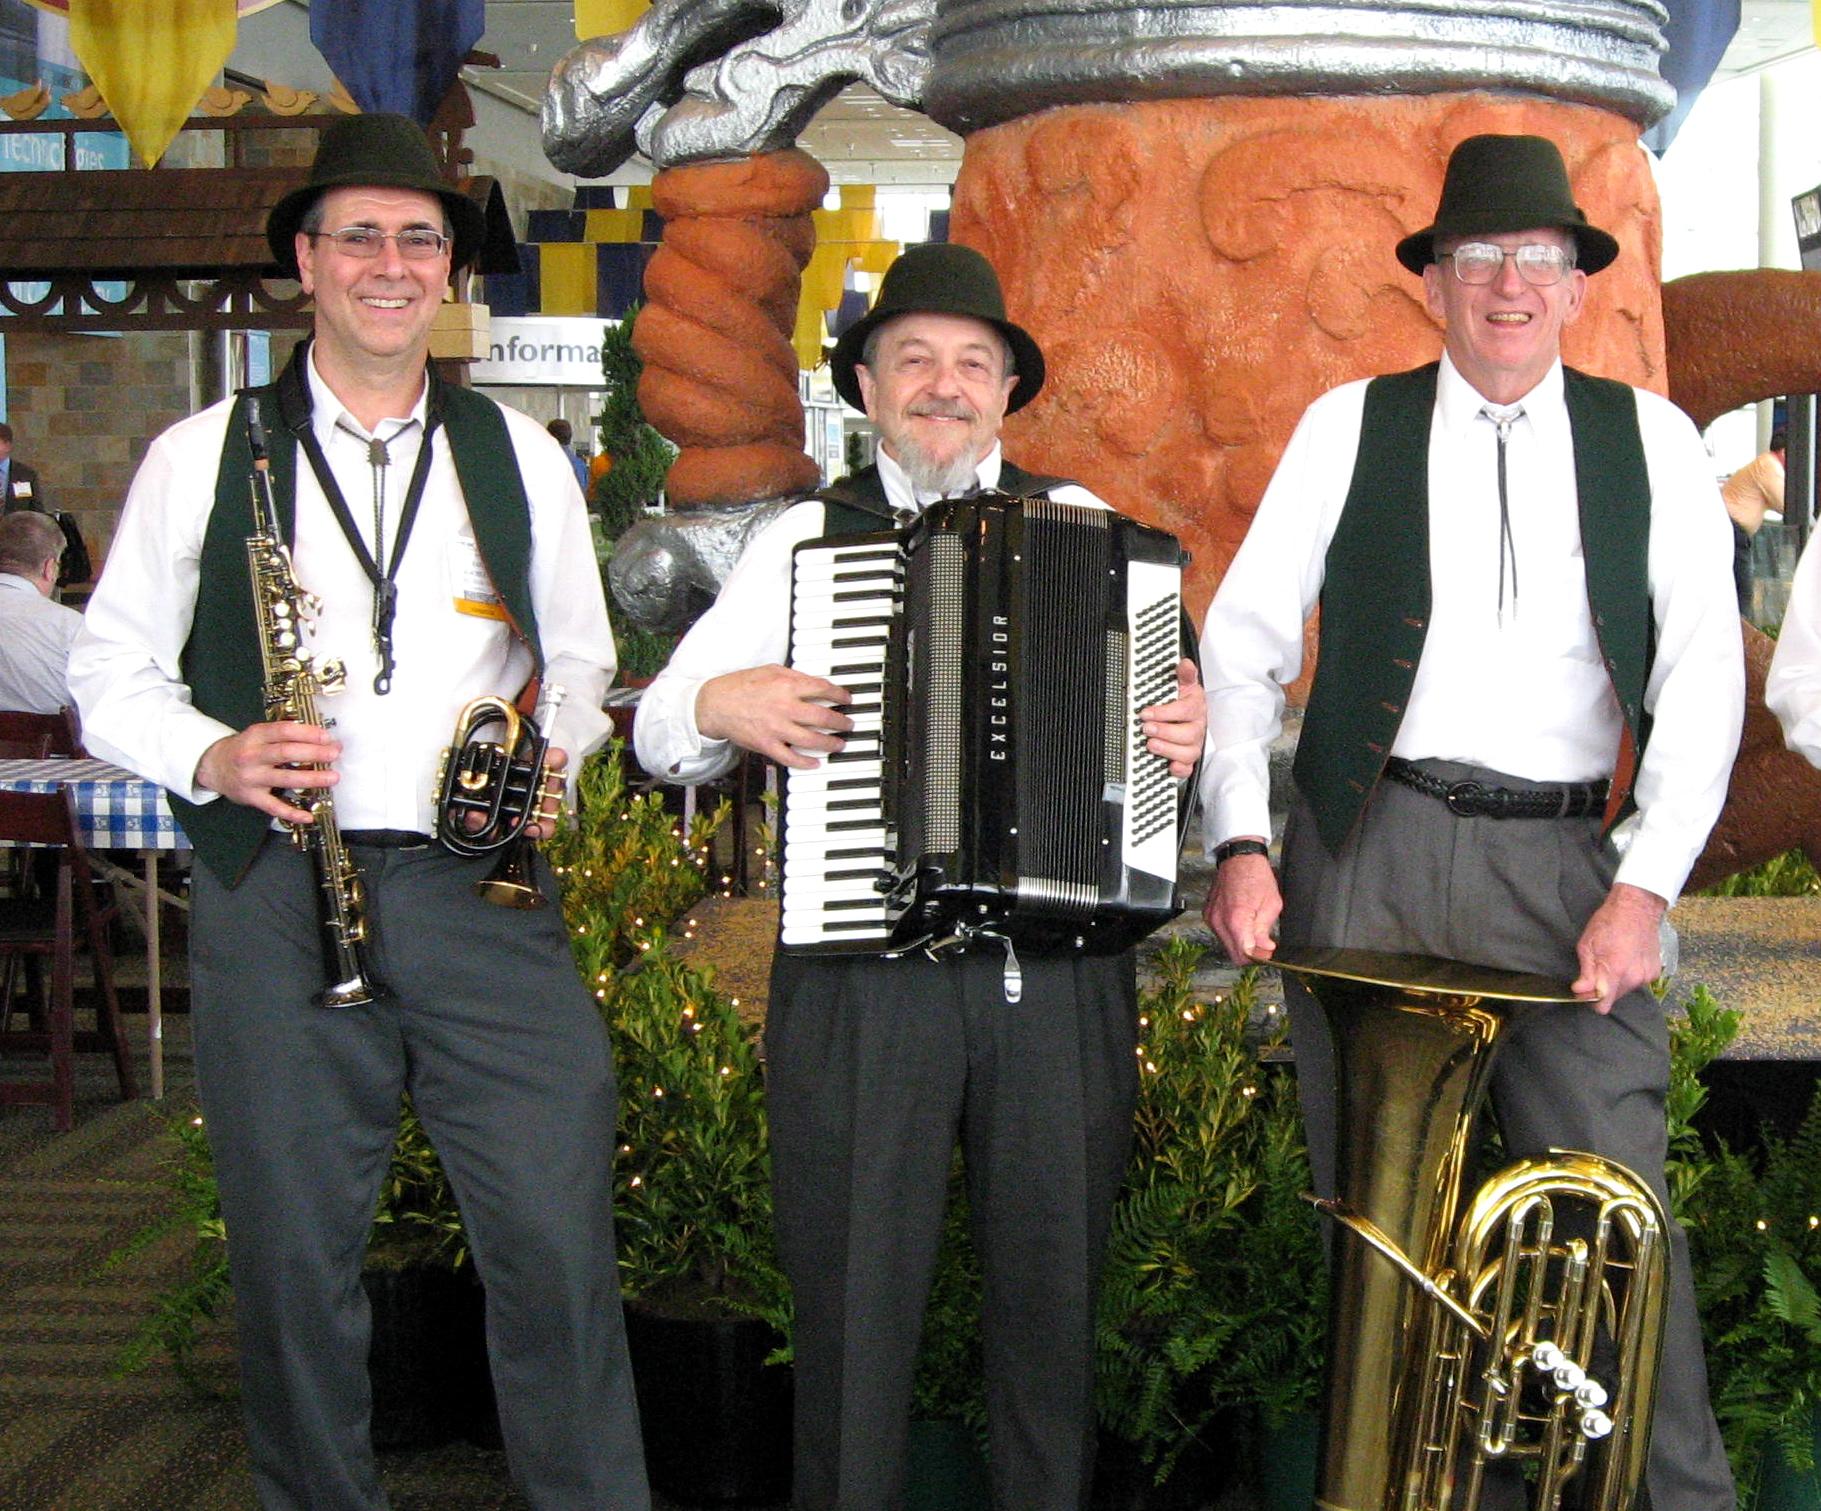 Fog City German Band